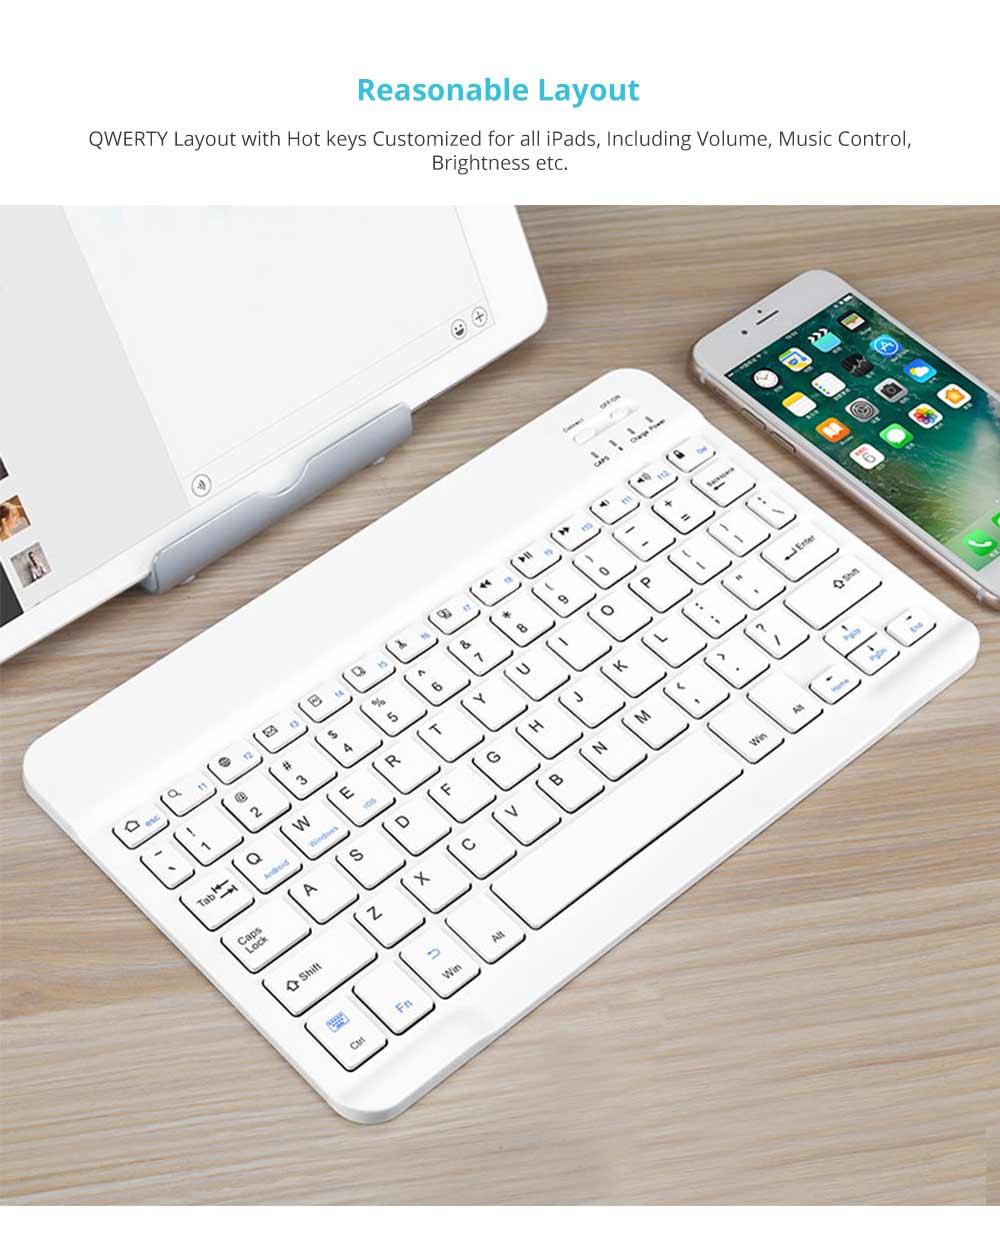 Universal Ultra-thin Bluetooth Keyboard Portable Wireless Bluetooth Keyboard forApple iPad Air 3/2/1, iPad Pro, iPad Mini 4/3/2/1, iPad 4/ 3/ 2, iPhone, Windows and Mac Computers, Android and iOS Tablets and Smartphones Available 9